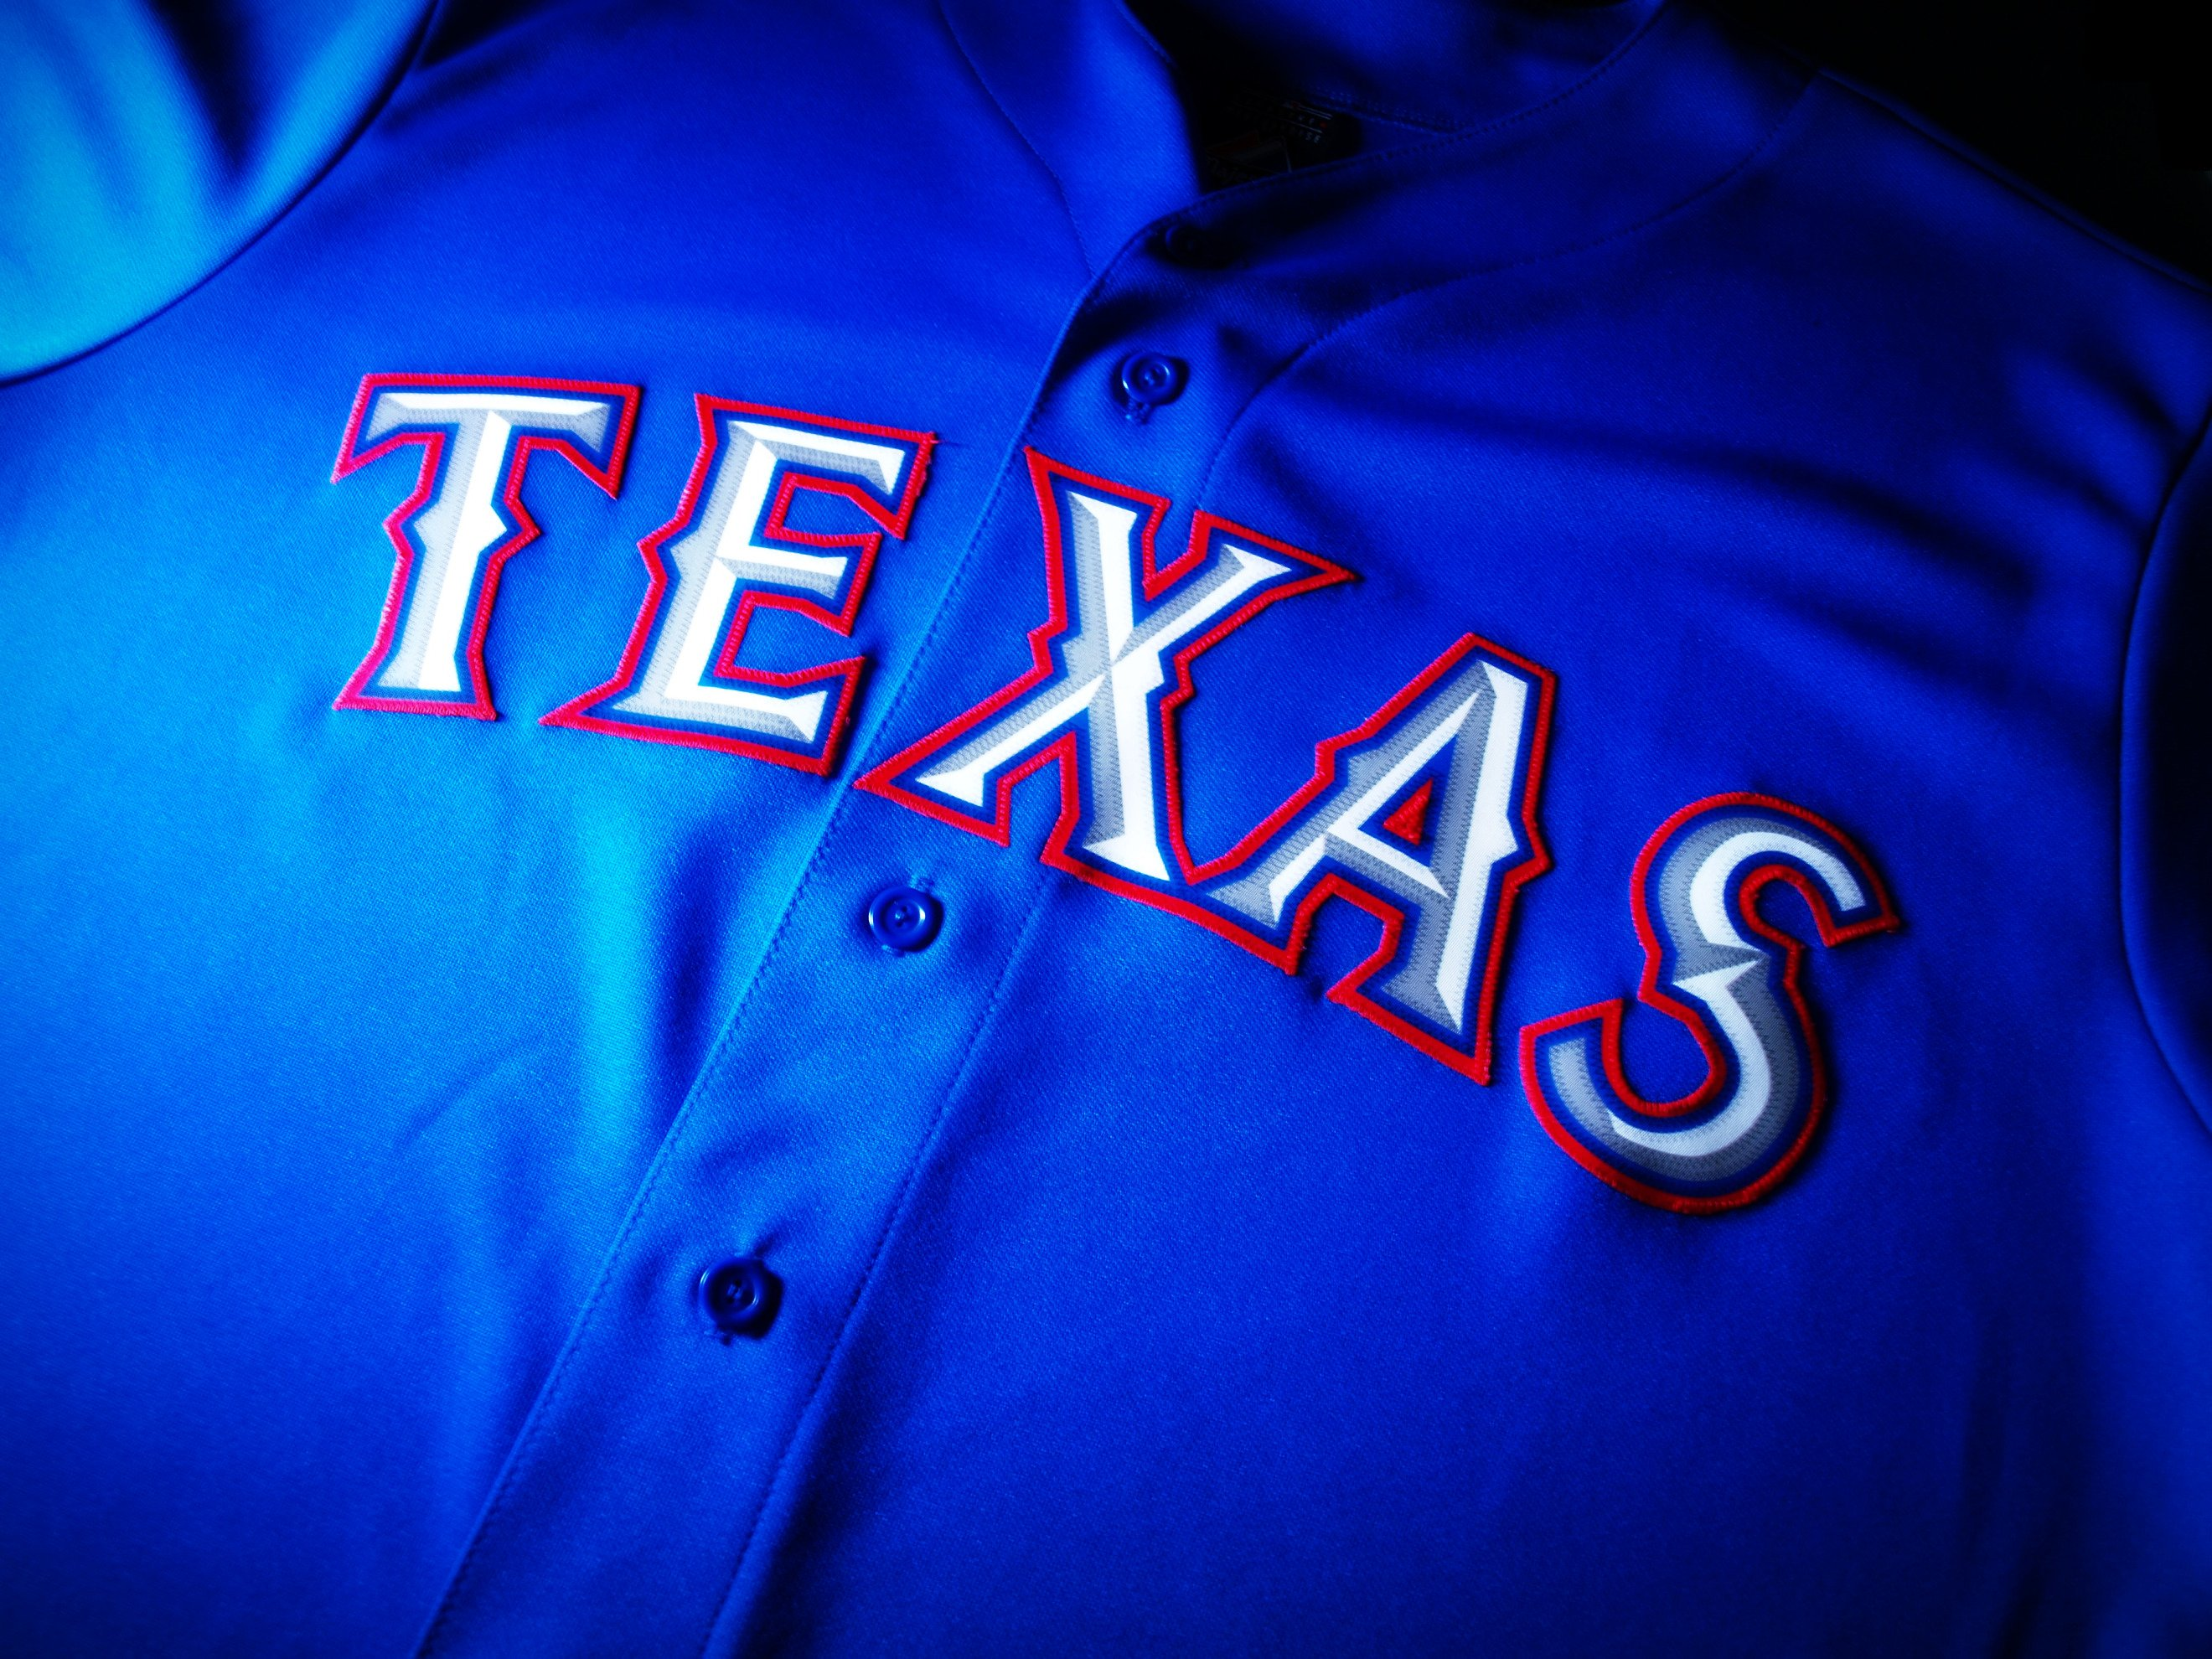 Texas Rangers Blue Jersey by yume ninja 2640 x 1980 2640x1980